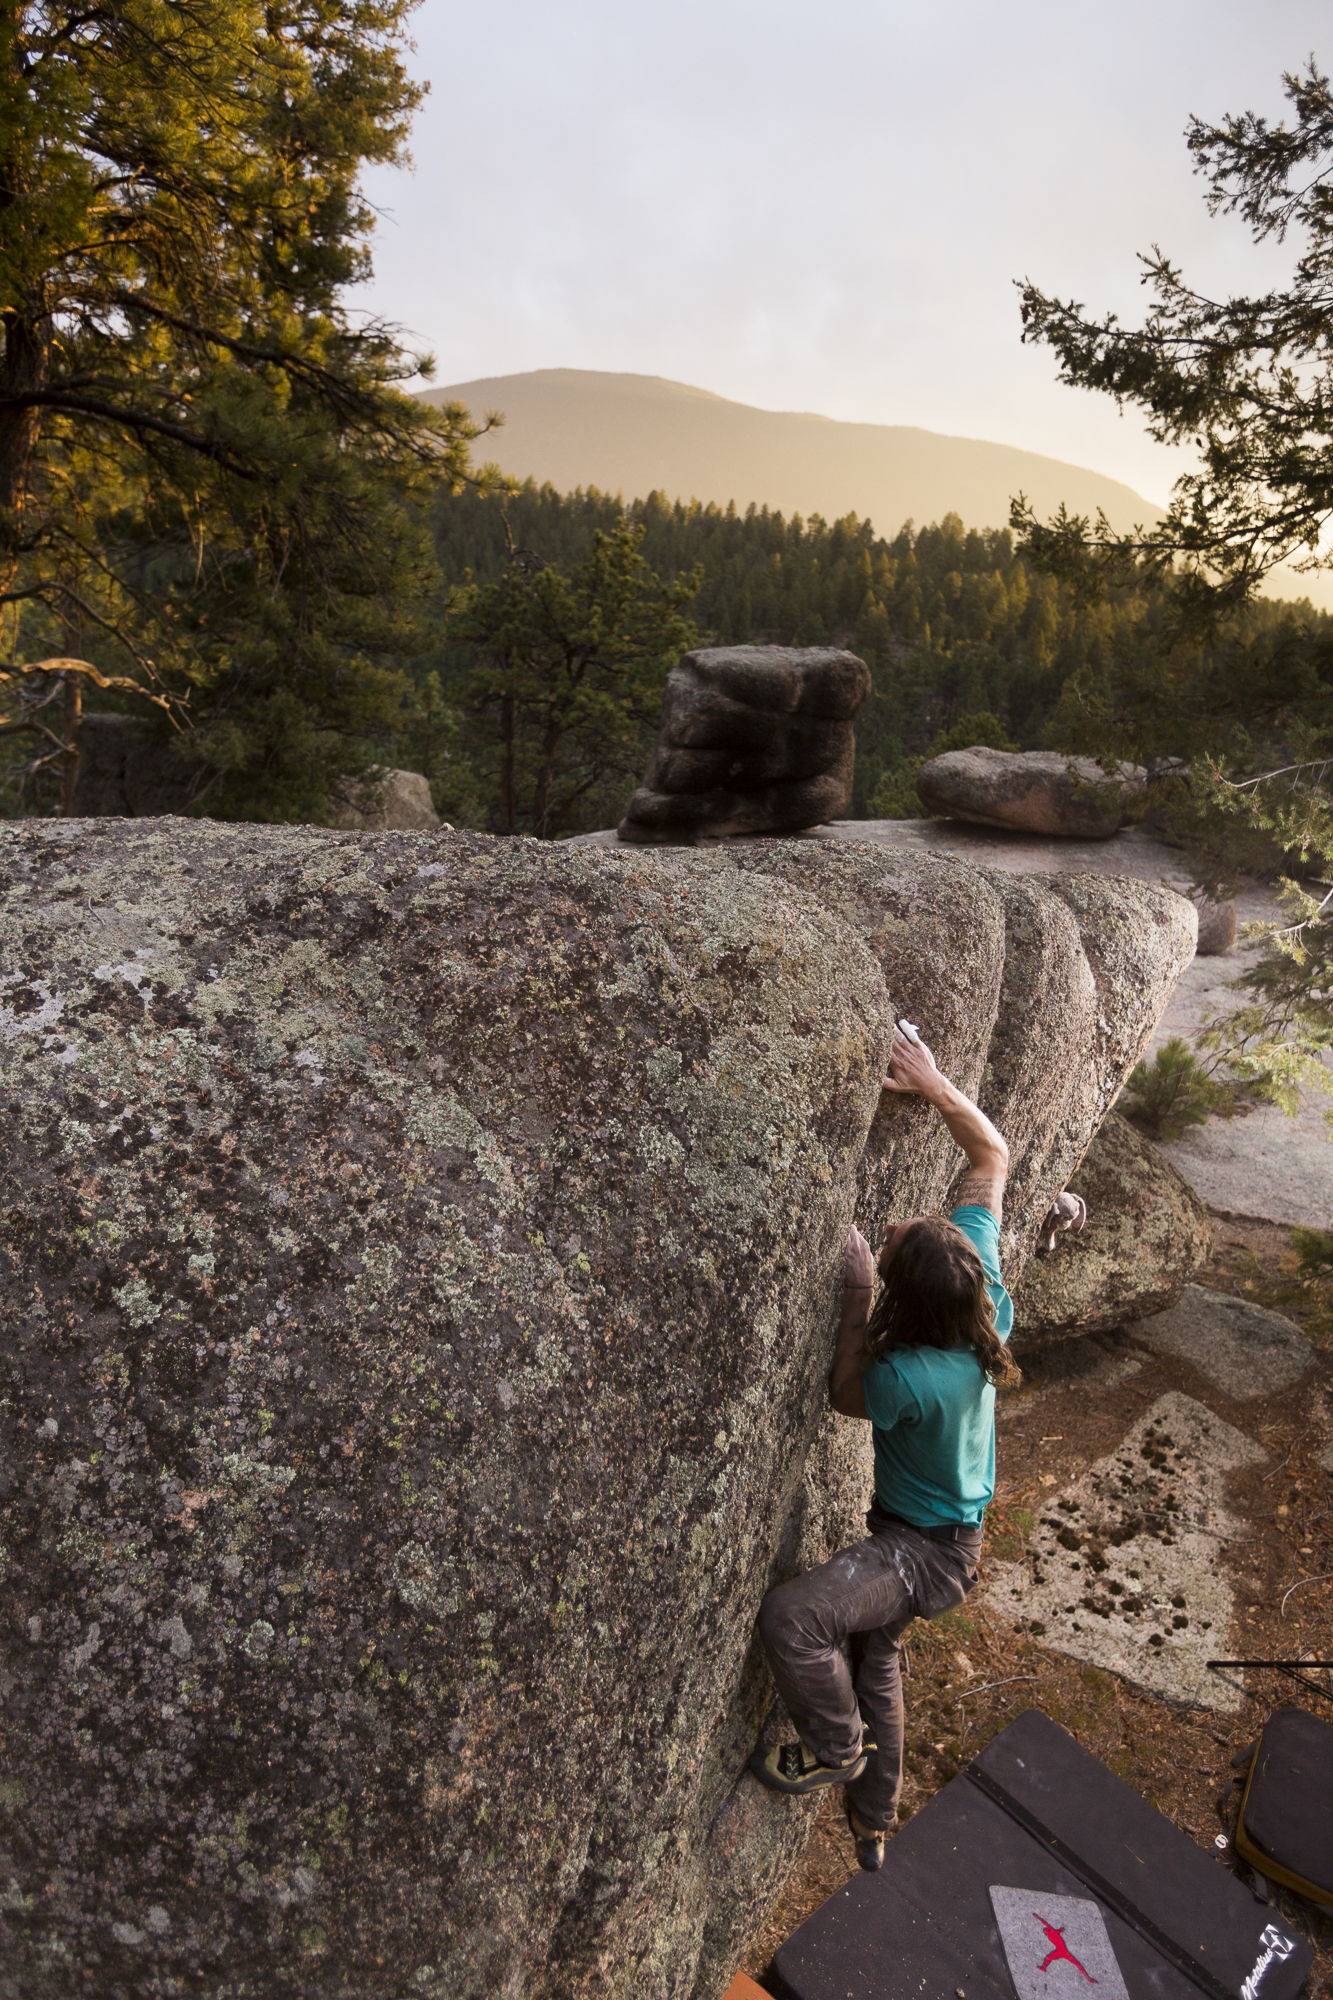 Pike_National_Forest_Bouldering_CO-4948.jpg